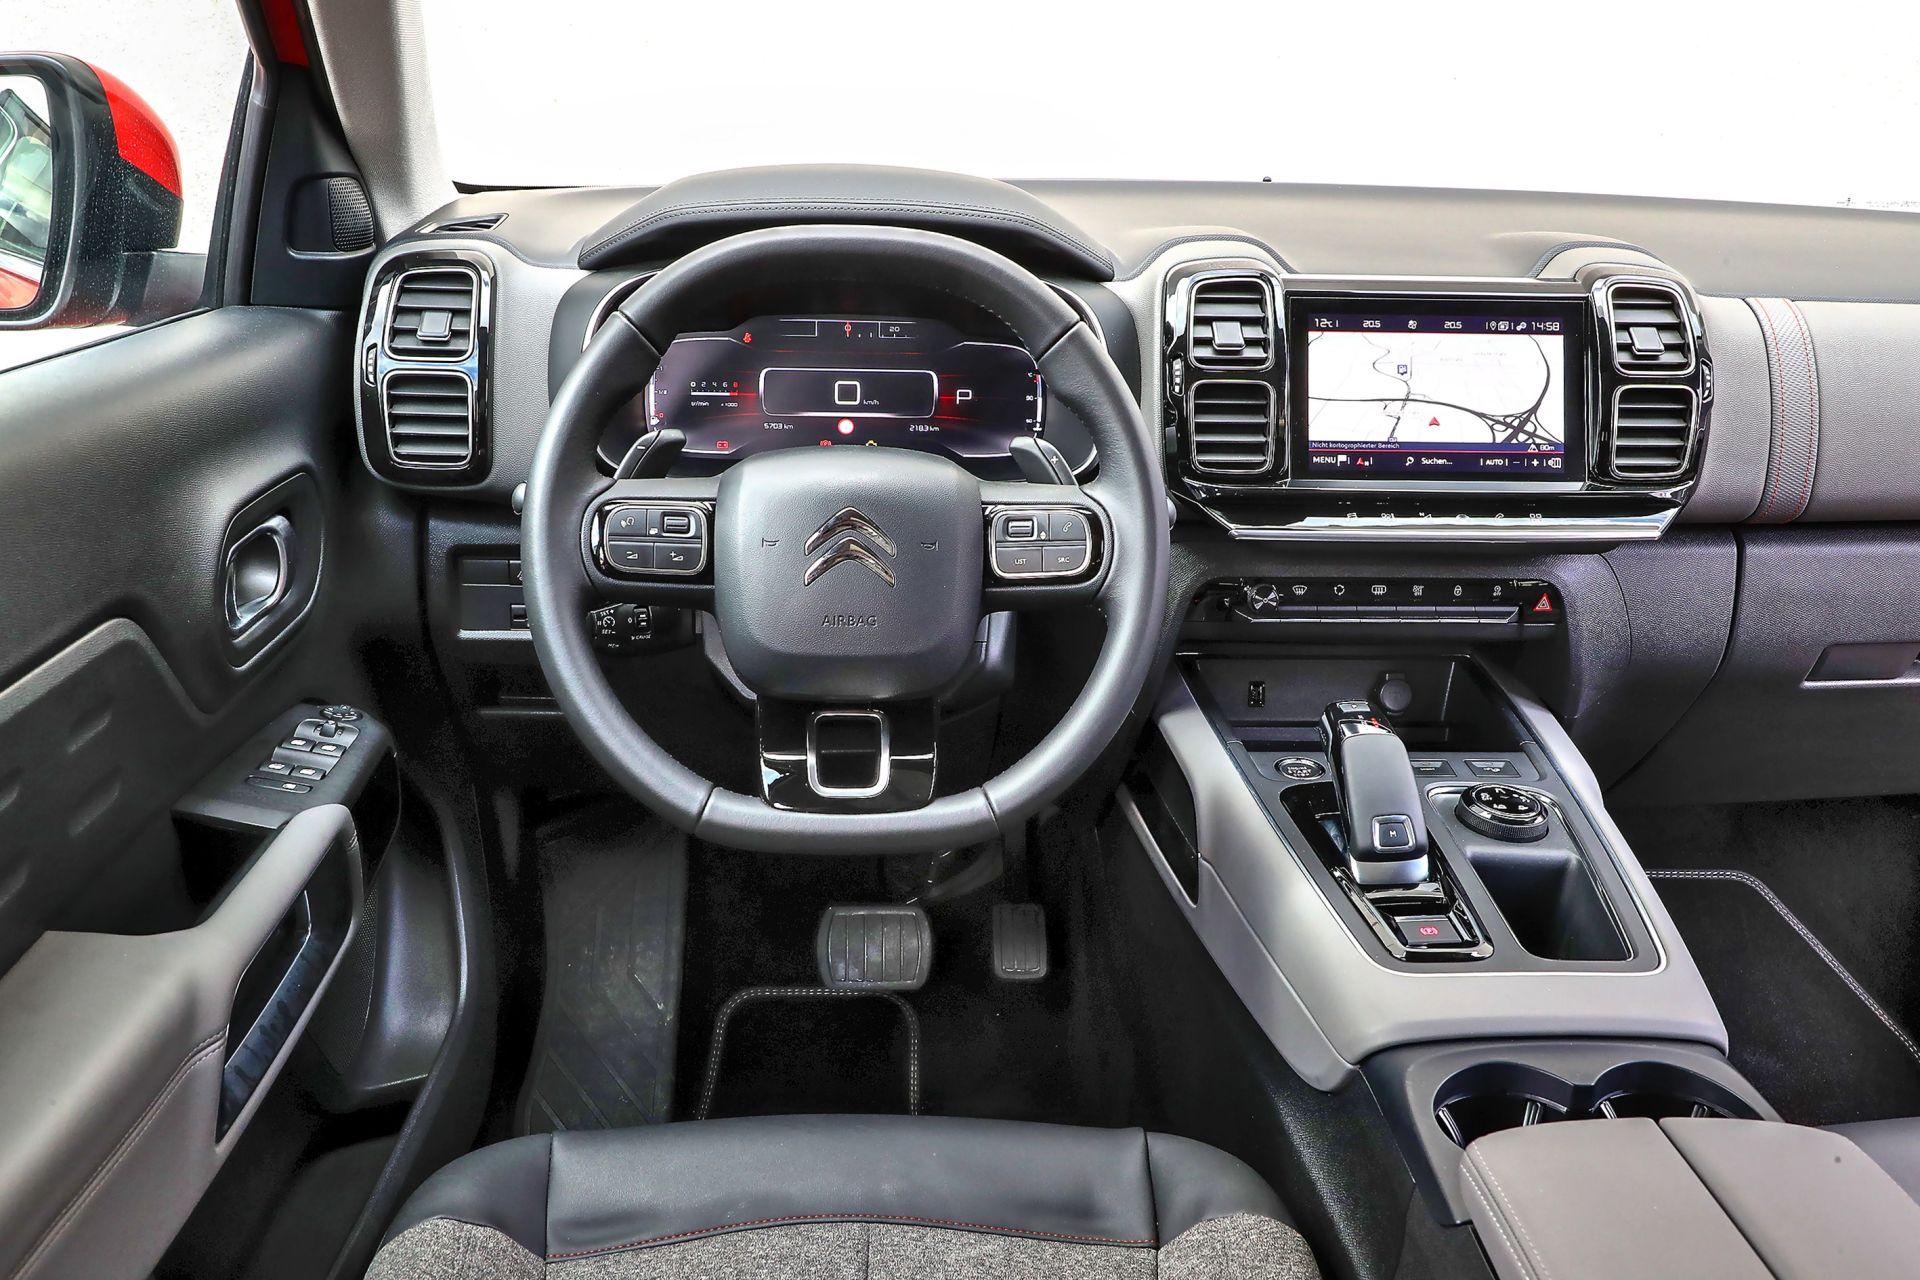 Citroen C5 Aircross Opel Grandland X Peugeot 3008 02